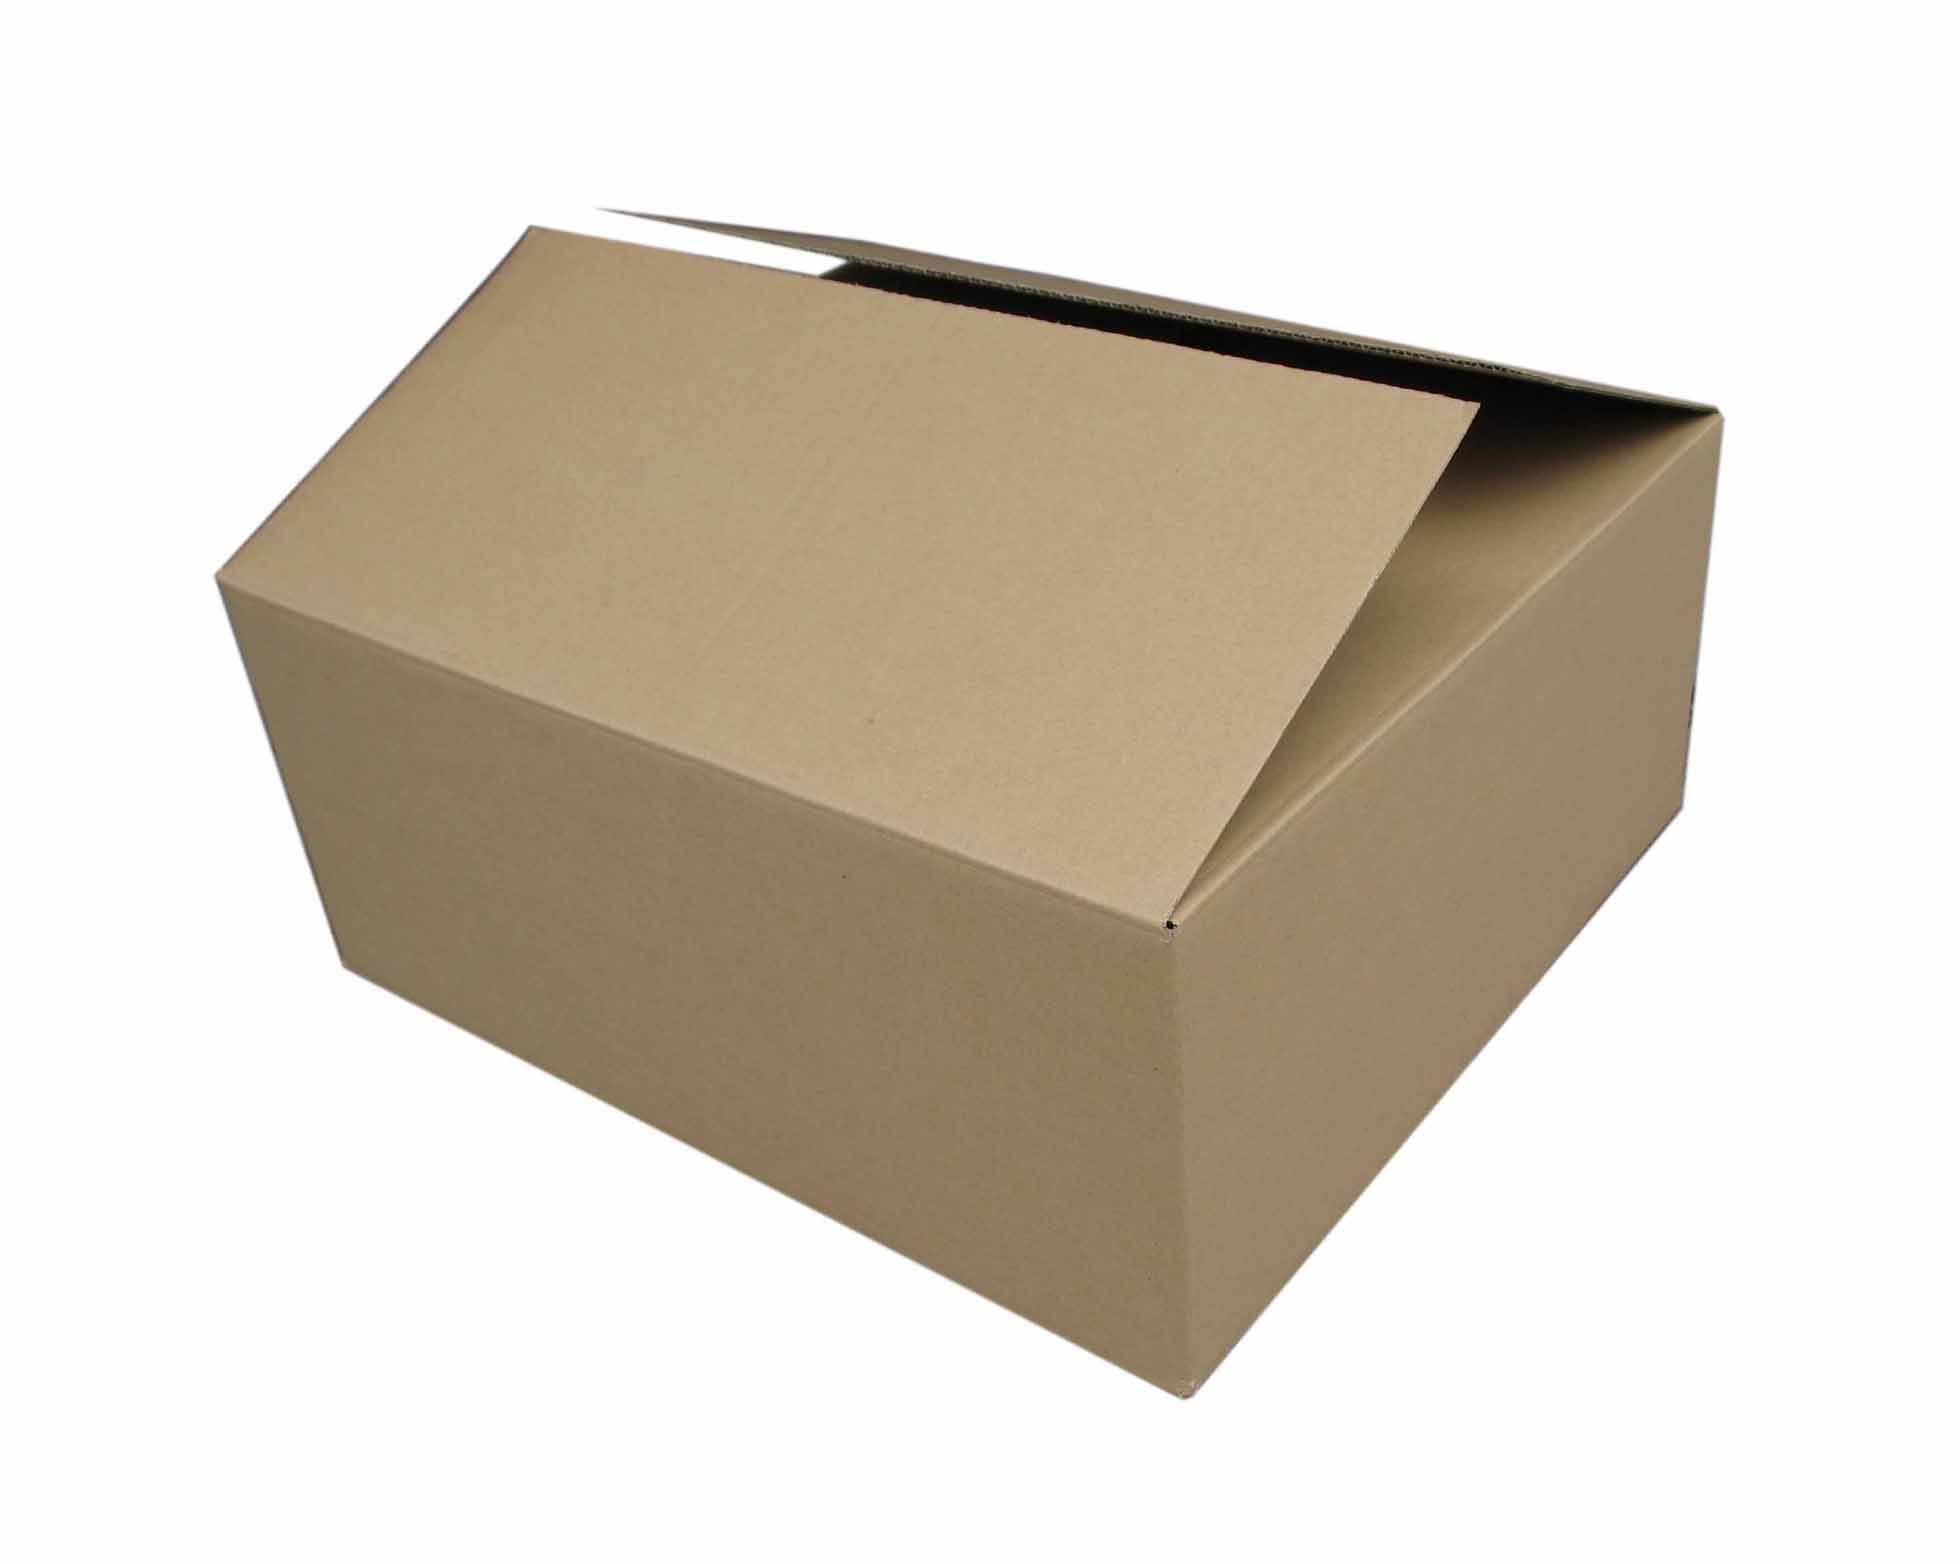 kutu ile